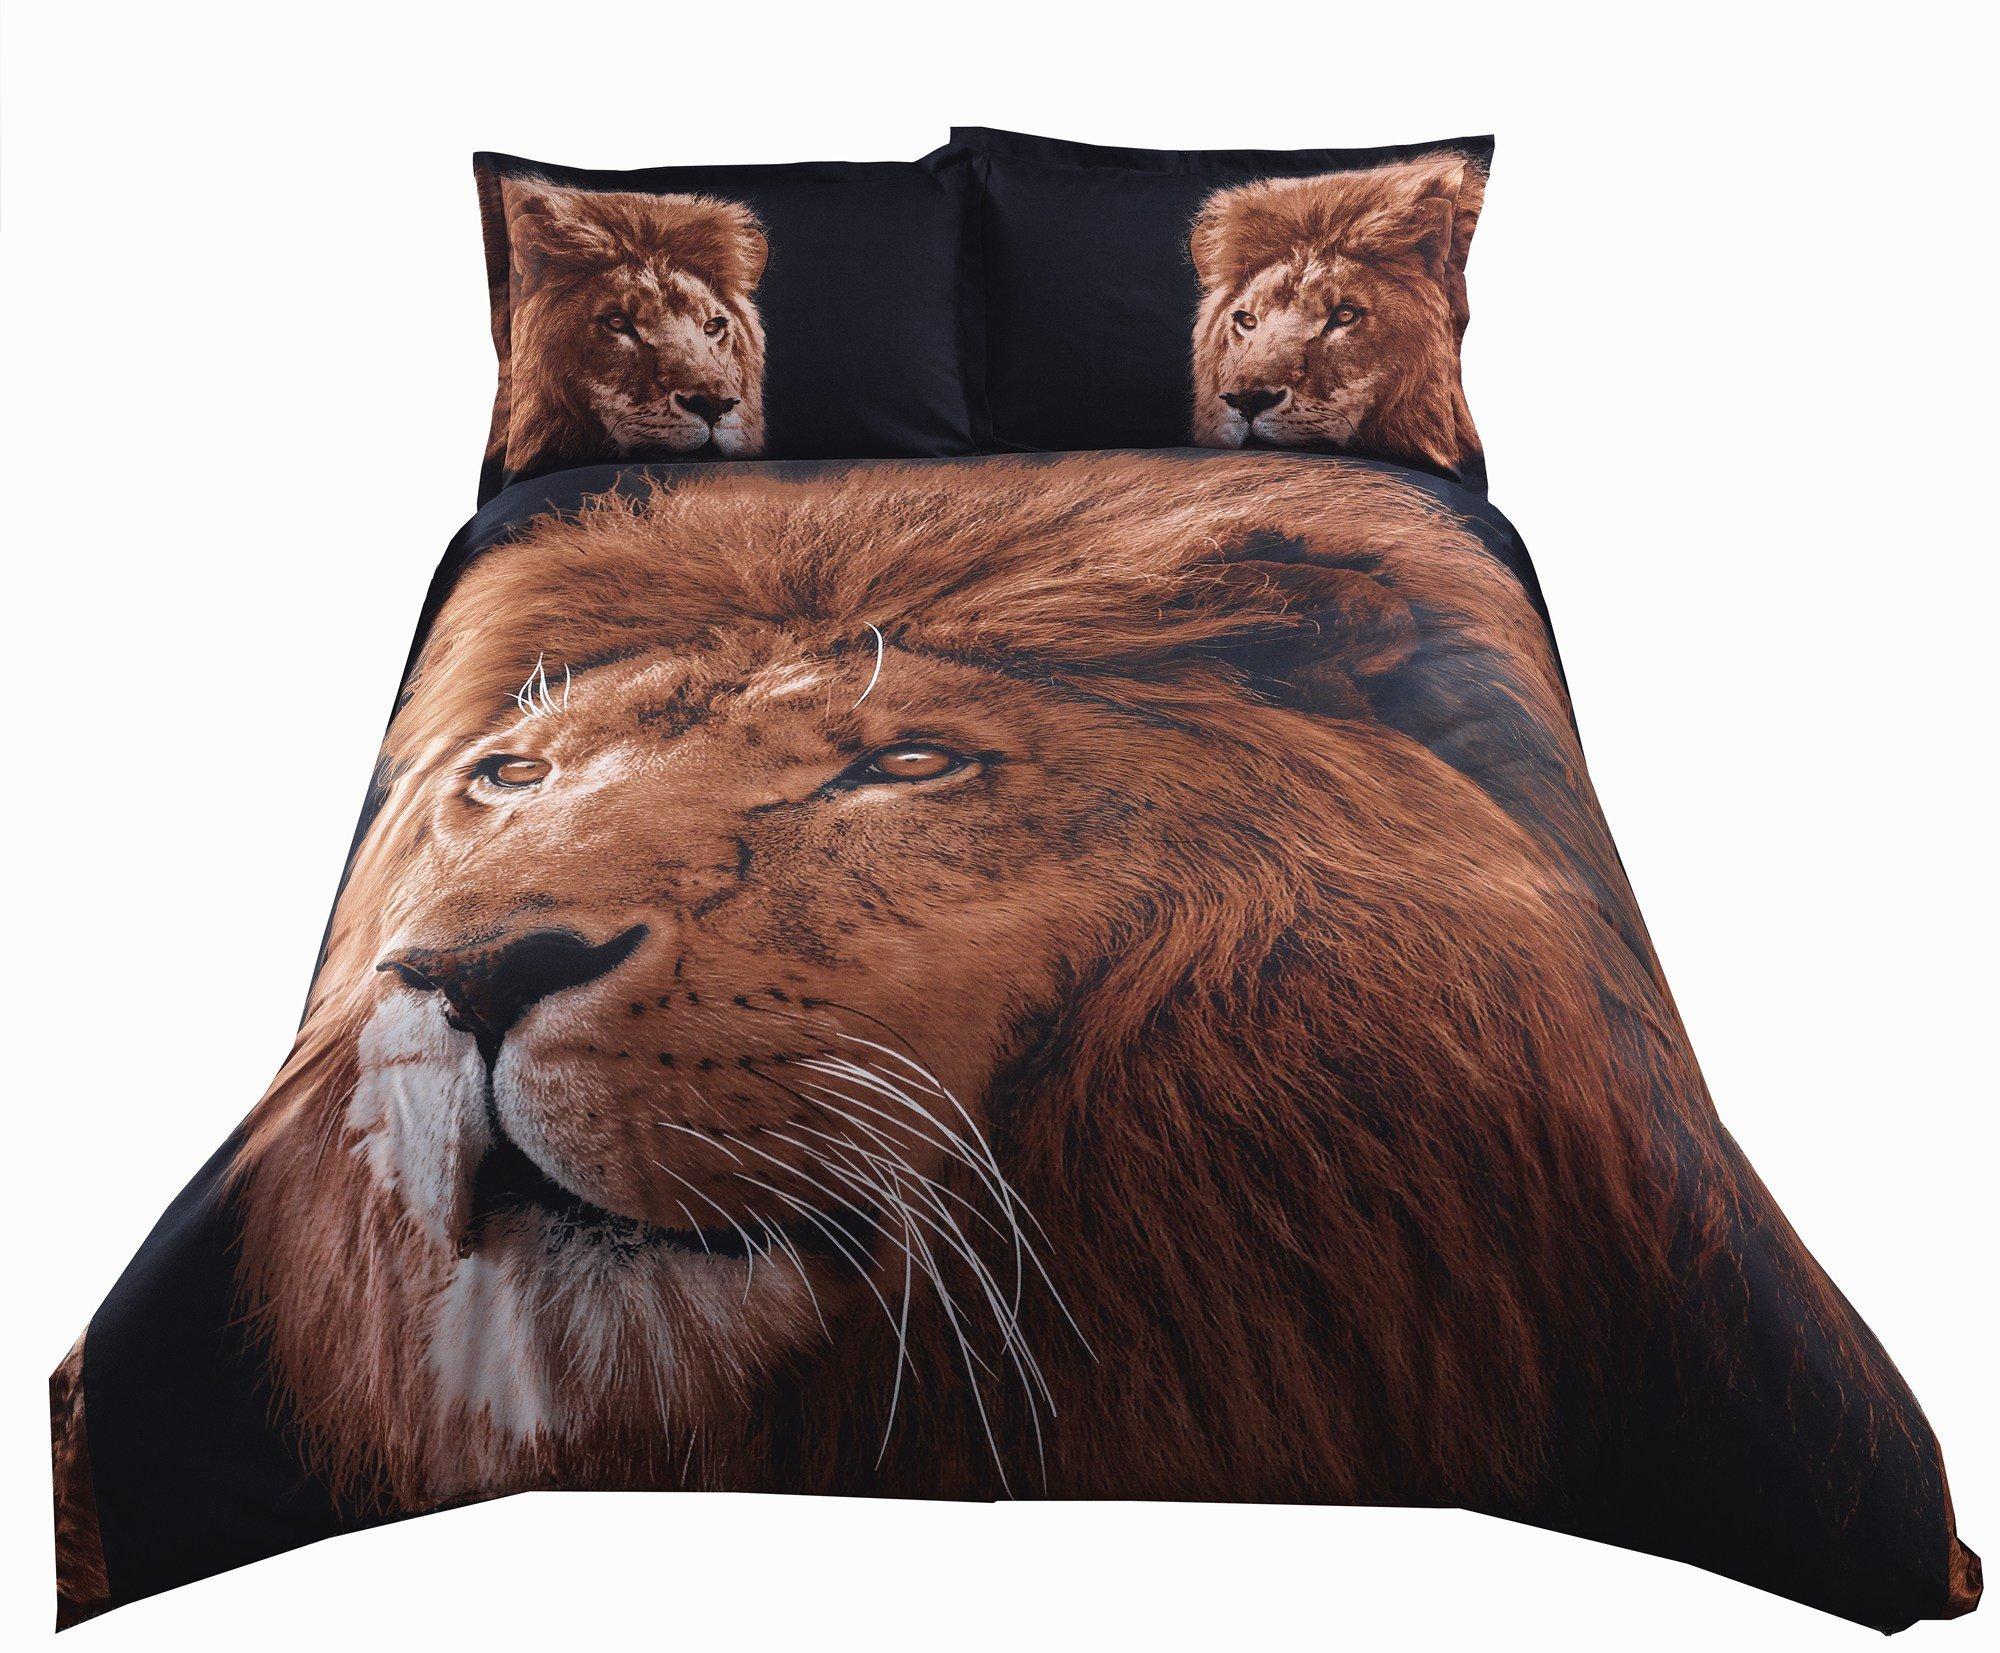 Alicemall Queen Size 3D Bedding Set Lion Black Back Print 4-Piece Polyester 3D Duvet Cover Sets, 4 PCS (1 Duvet Cover, 1 Flat Sheet and 2 Pillowcases) (Queen)